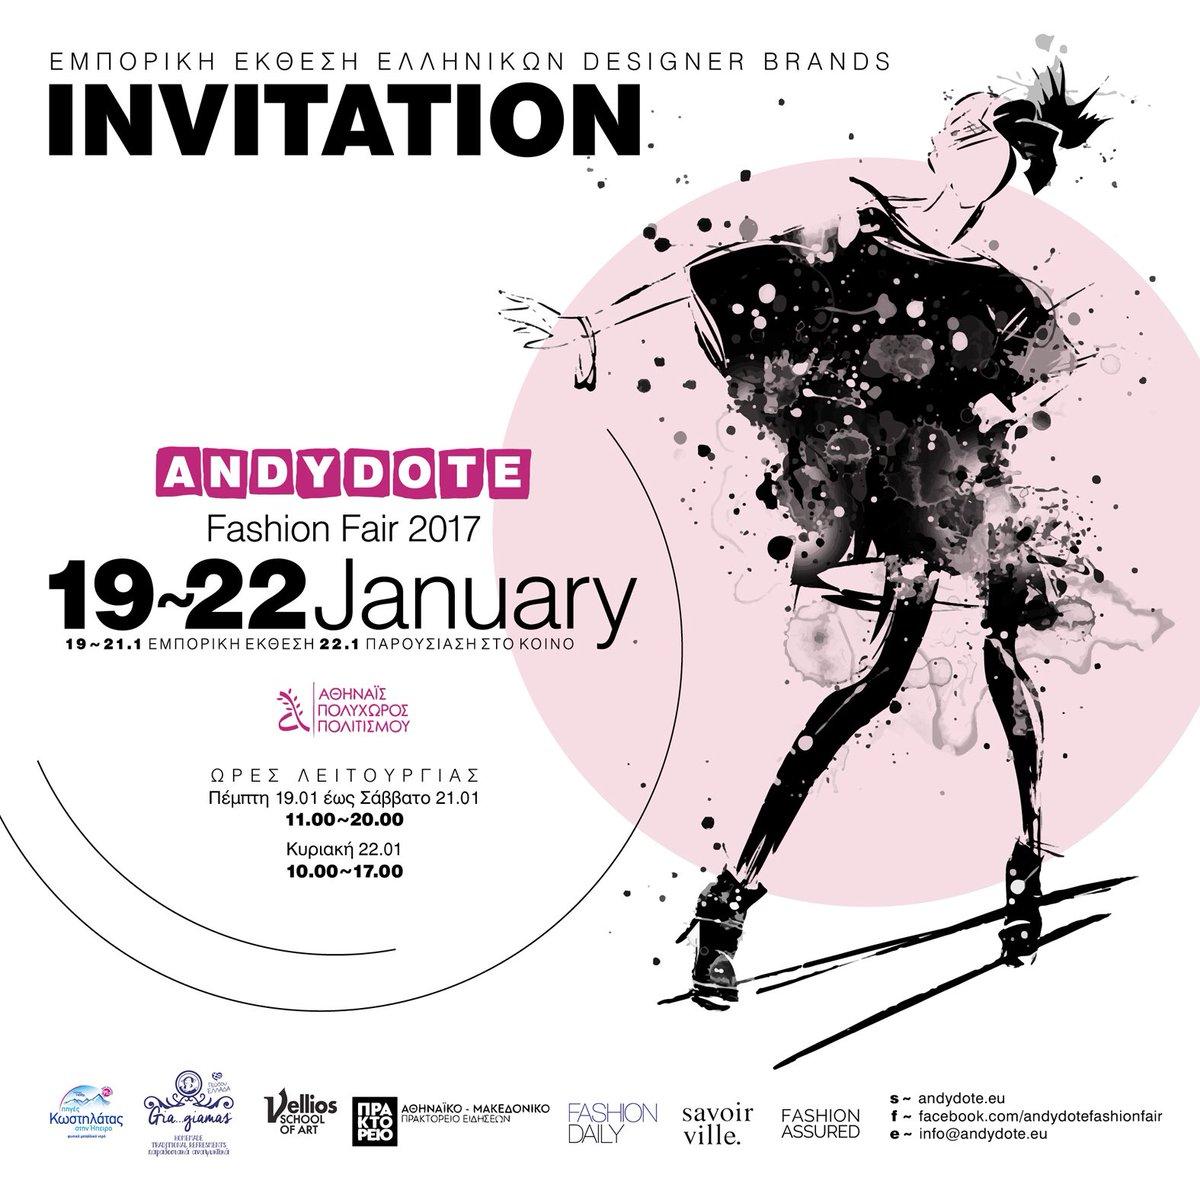 Andydote FashionFair on Twitter andydotefashionfair tradeshow